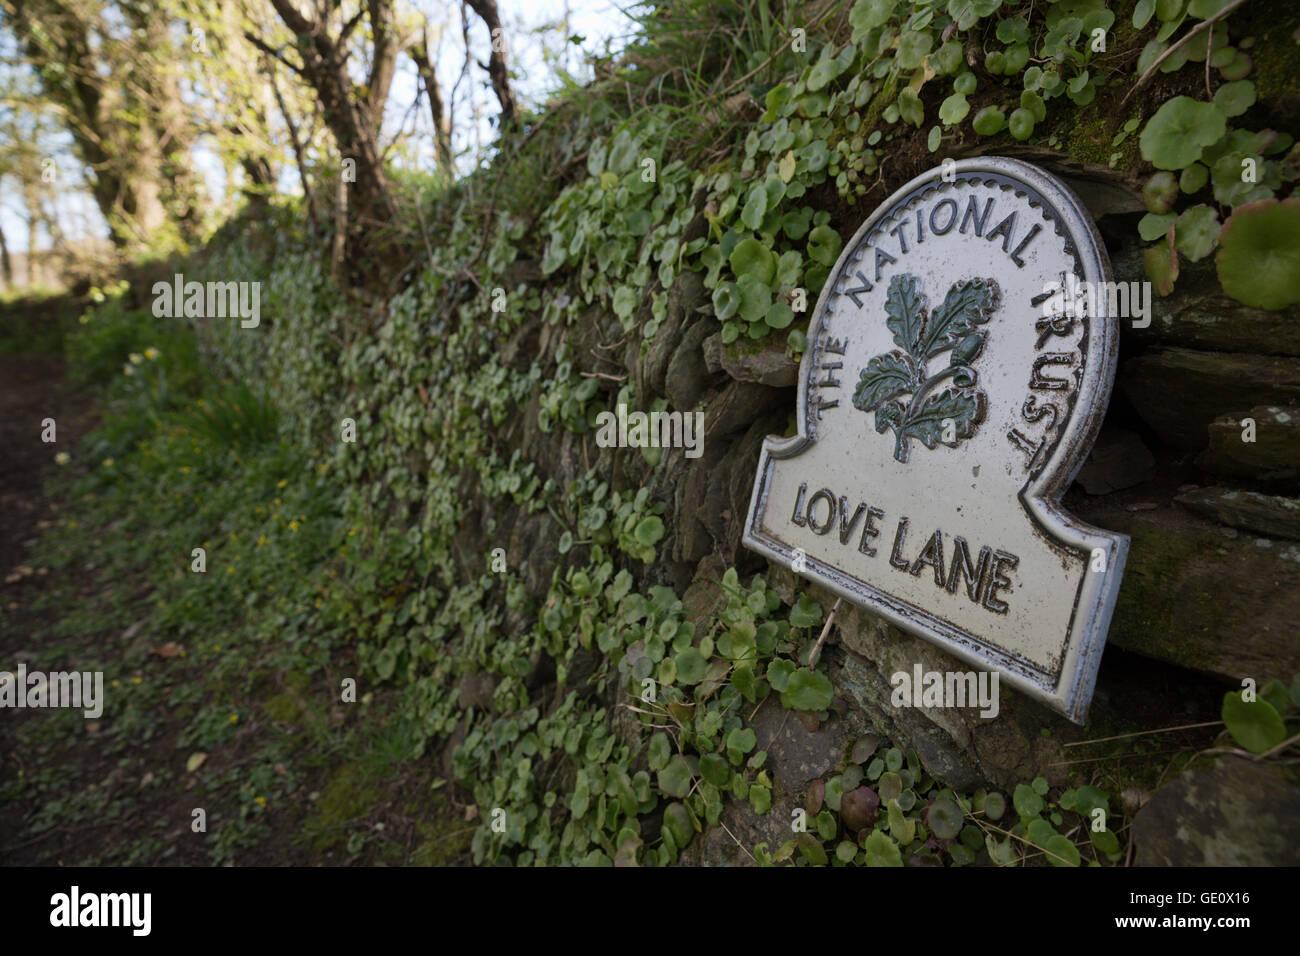 Love Lane country track, Fowey, Cornwall, England, United Kingdom, Europe - Stock Image